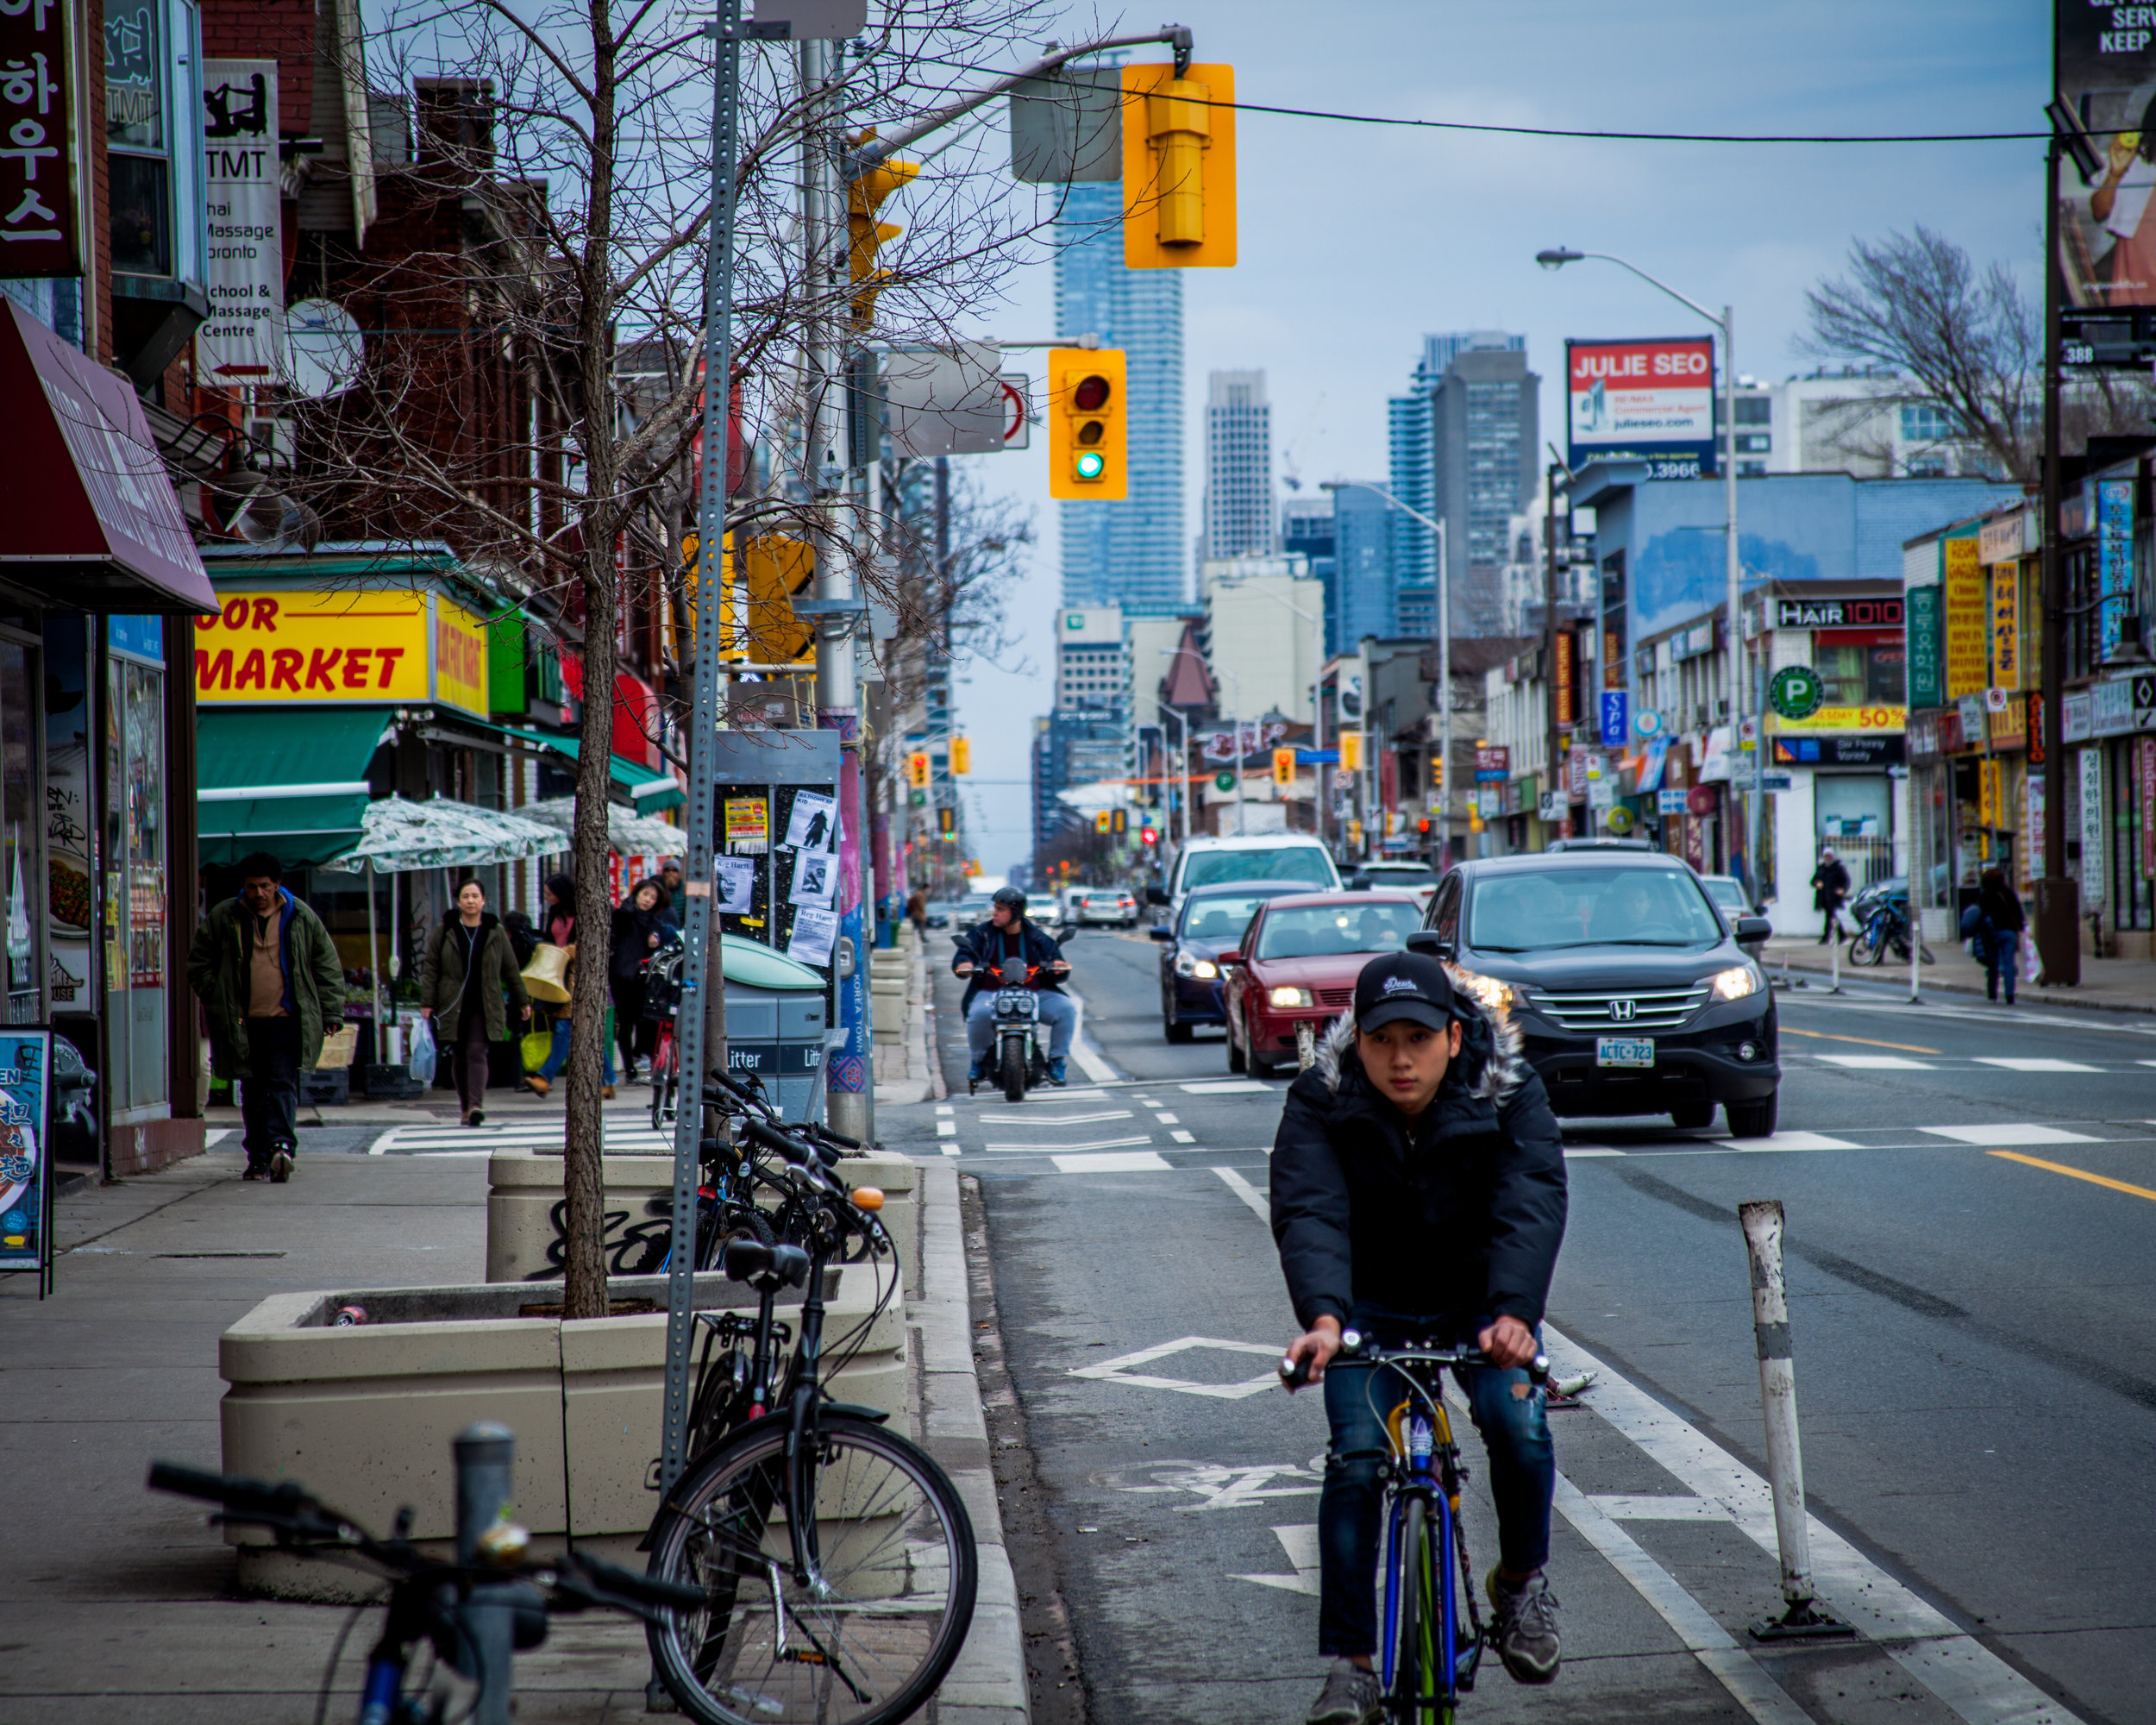 Toronto Koreatown